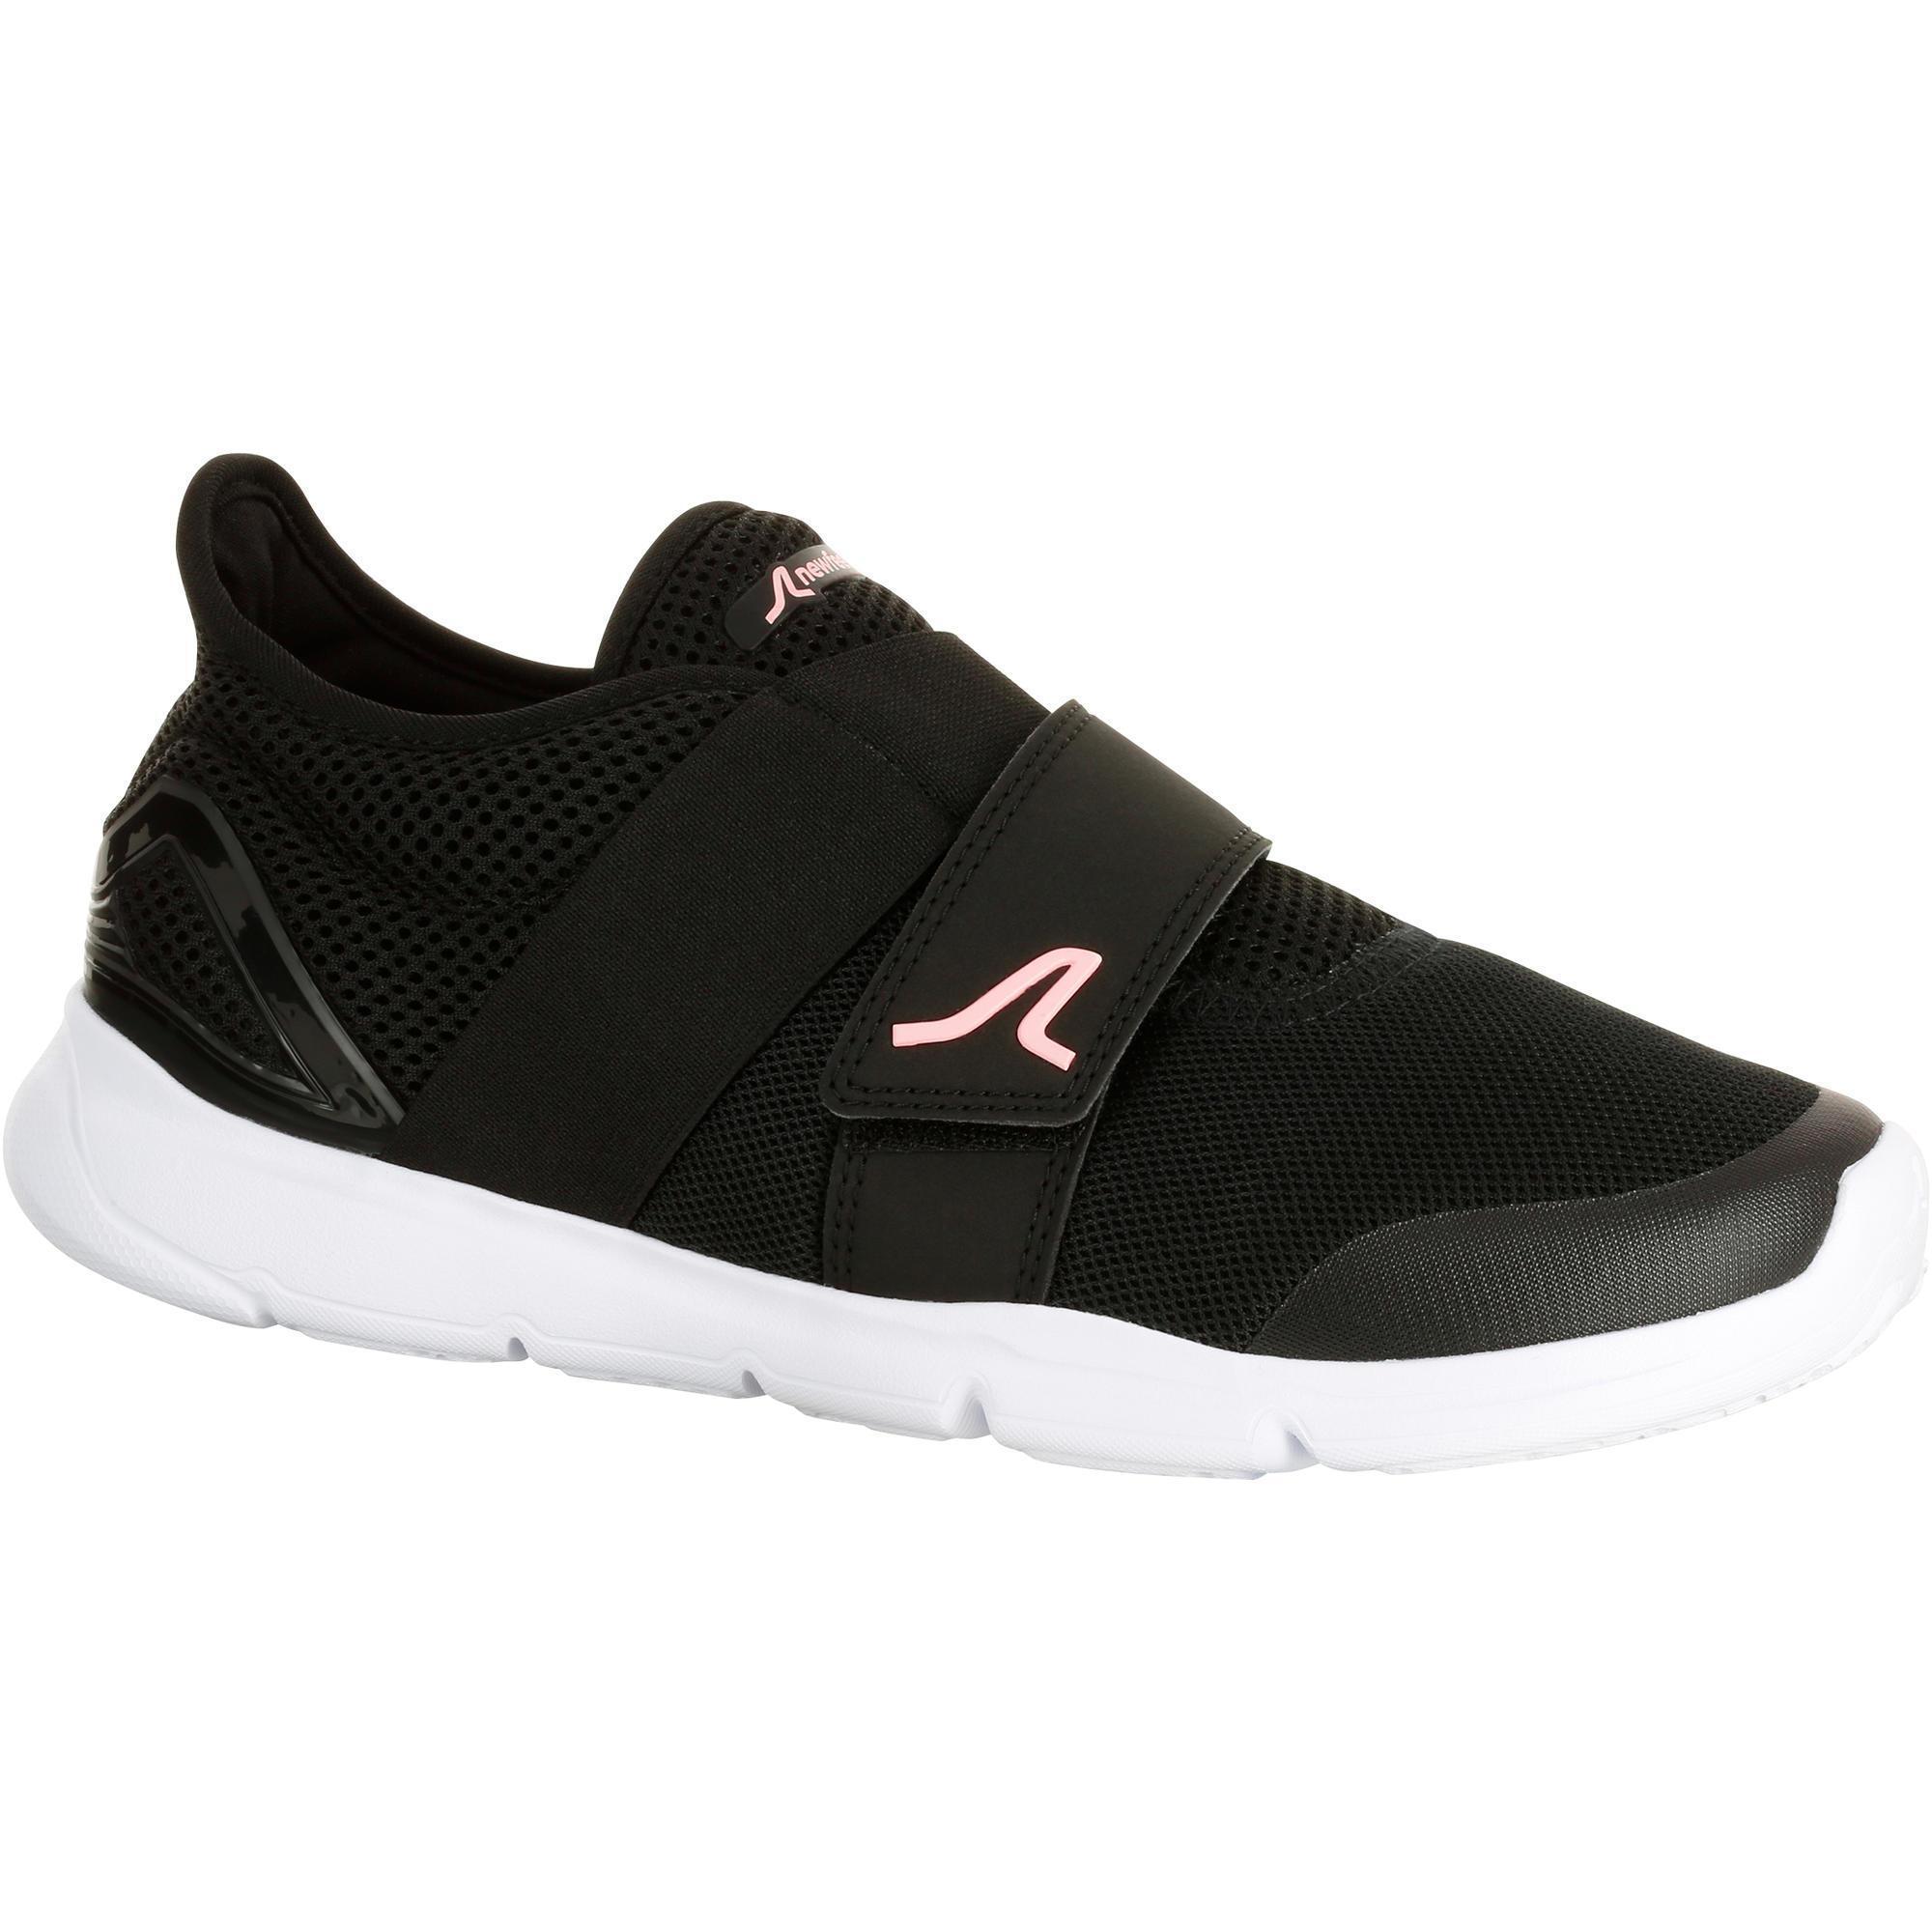 Walkingschuhe Soft 180 Strap Damen schwarz/rosa | Schuhe > Sportschuhe > Walkingschuhe | Newfeel